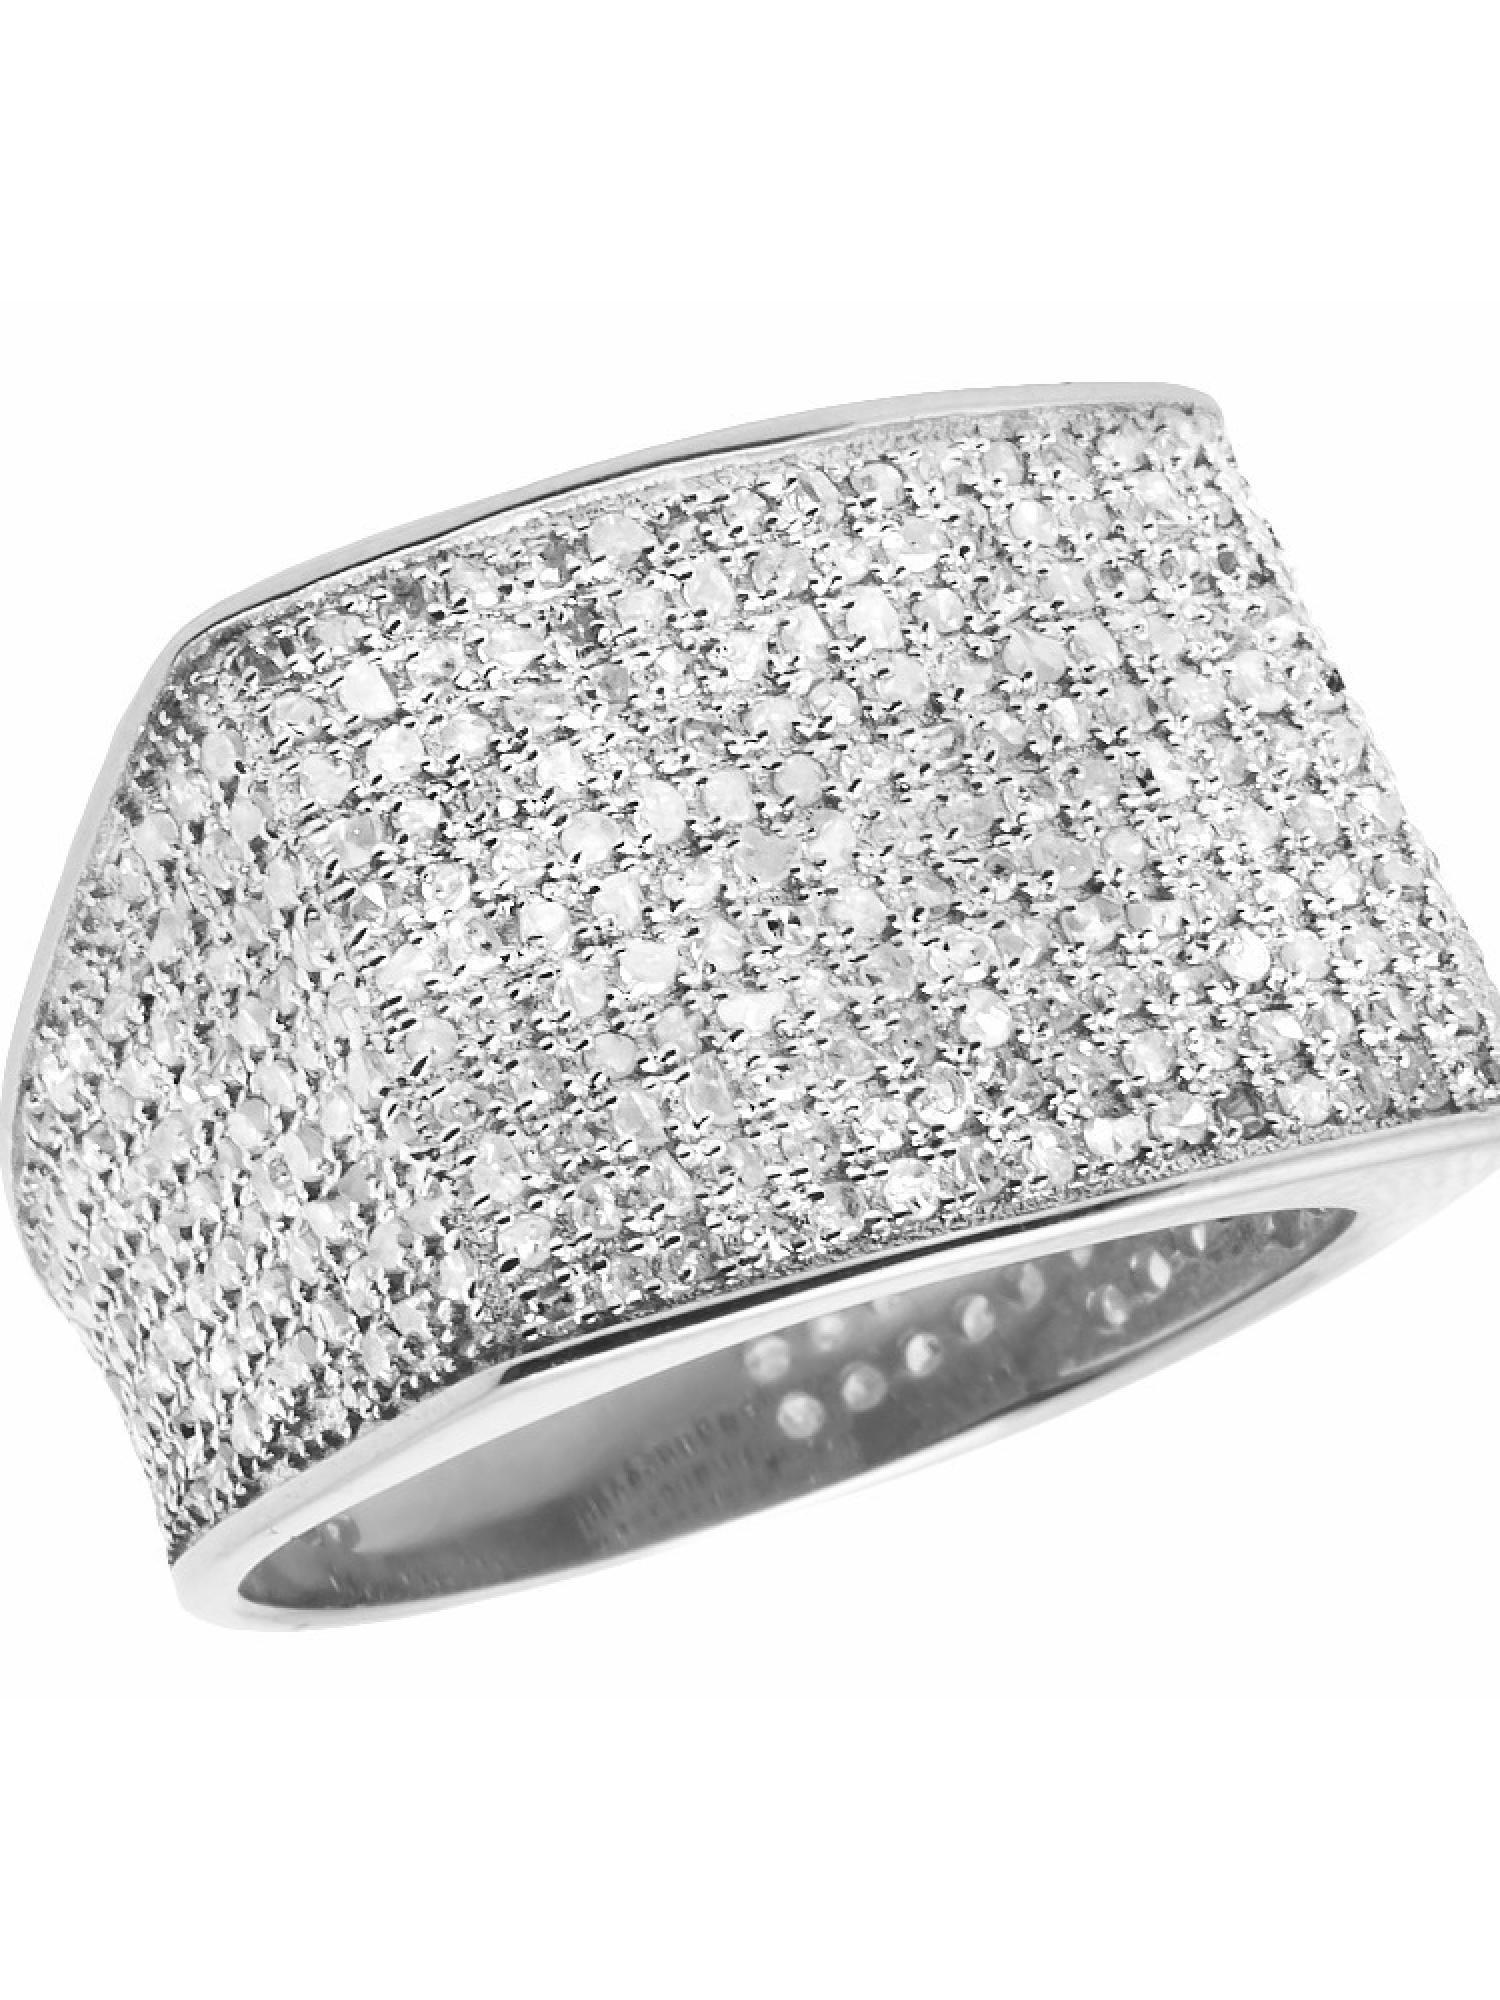 10K White Gold Men's Pave Eternity Real Diamond Ring Band 1.35 Ct Sz-7